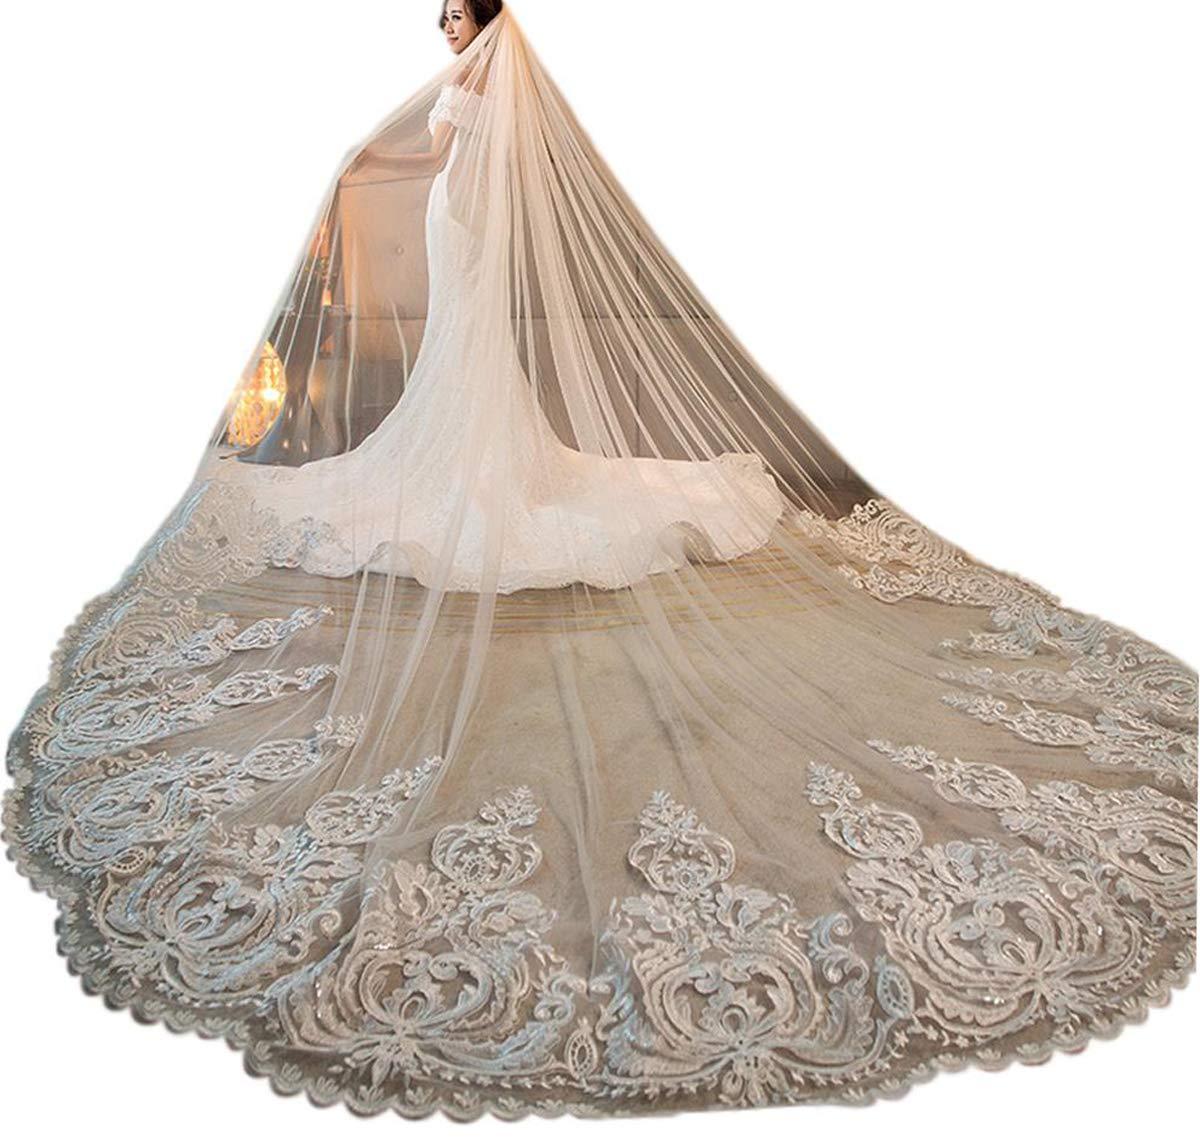 Women's 3M 3.5M 4M 1T Lace Applique Chapel Cathedral Bridal Veil With Free Comb (White, 4M Length)